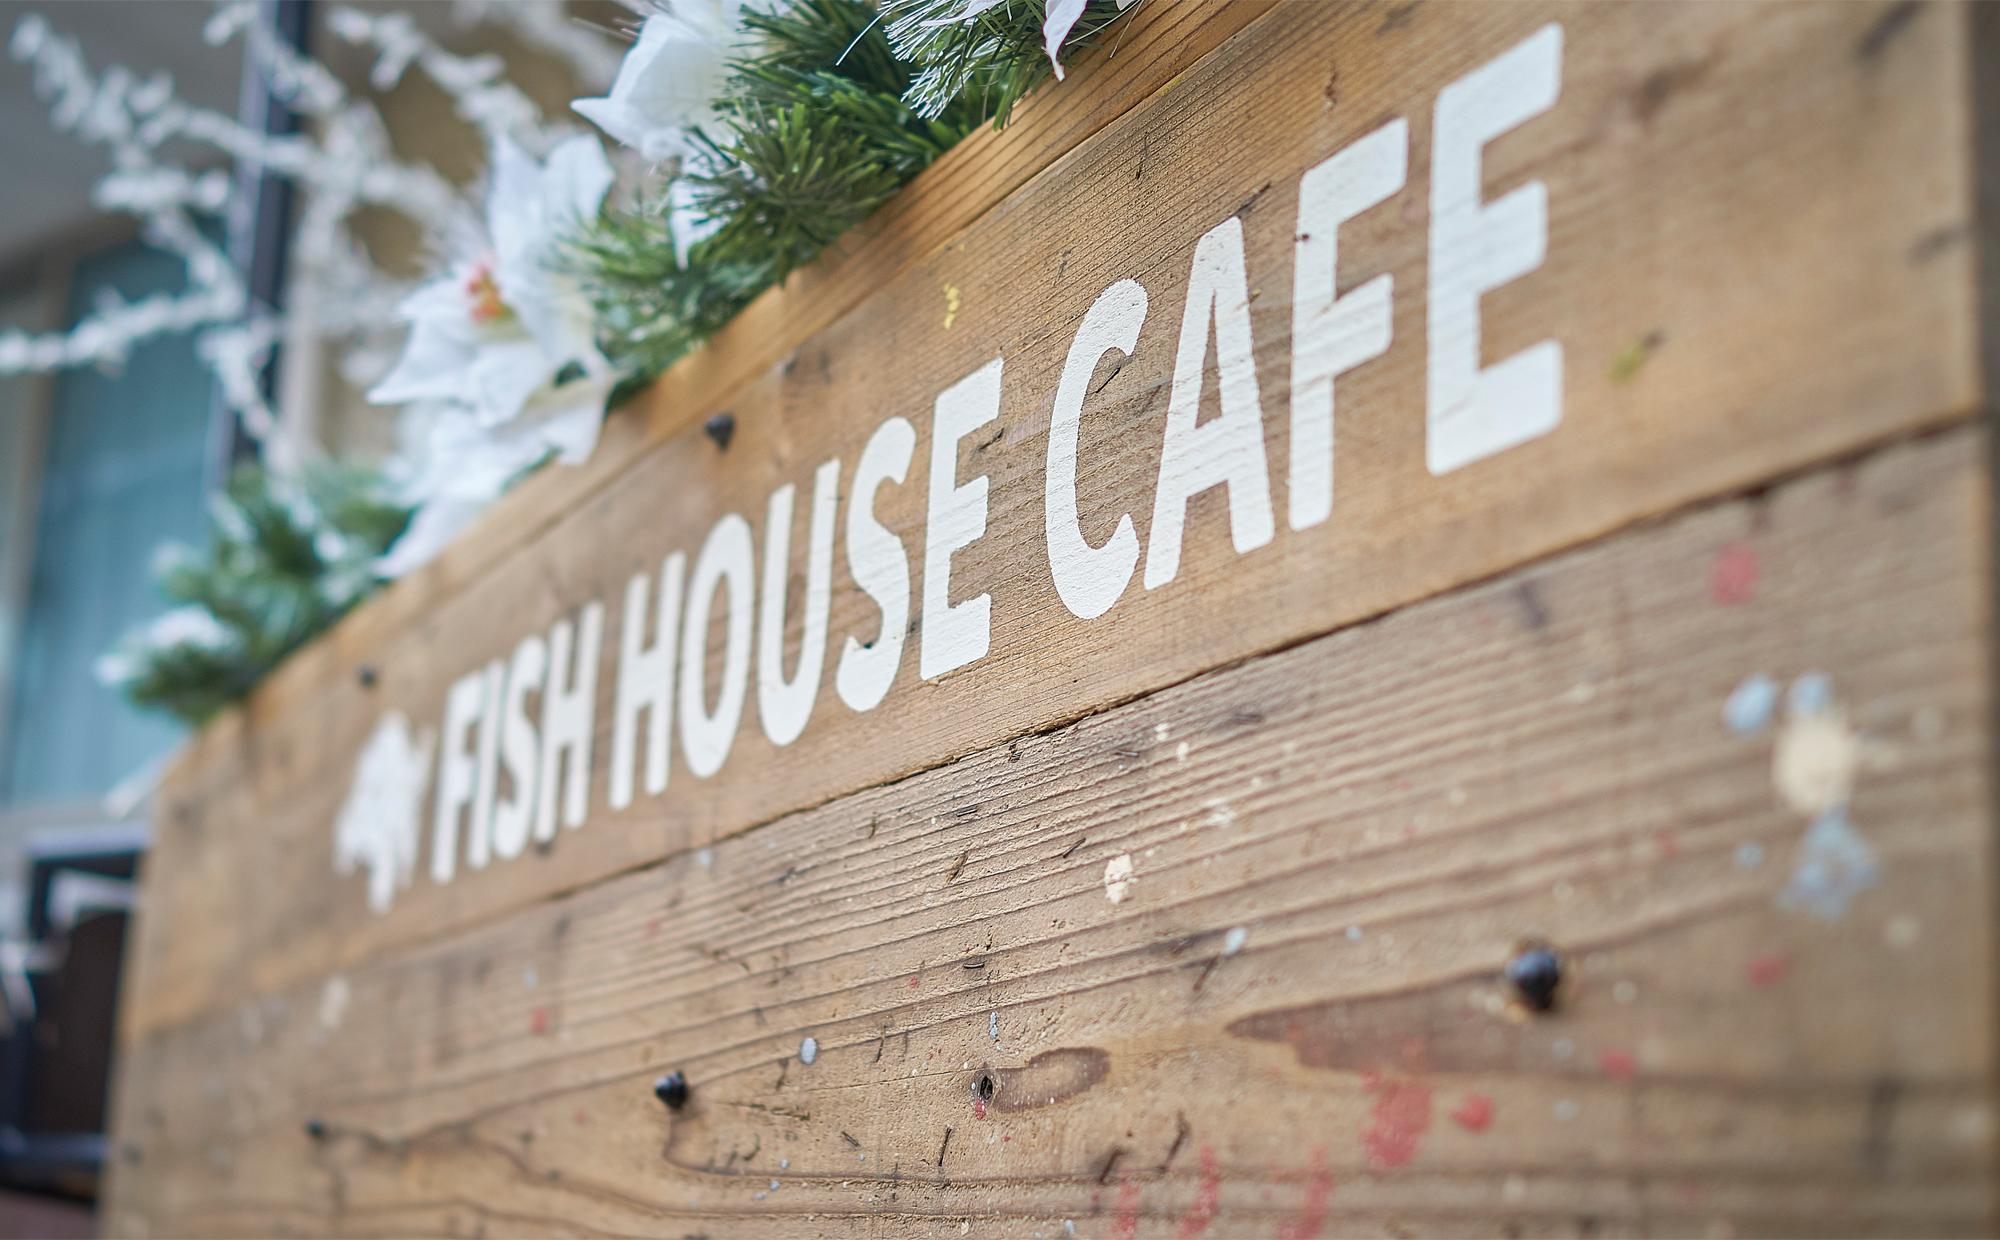 Fish house cafeに行ってきました